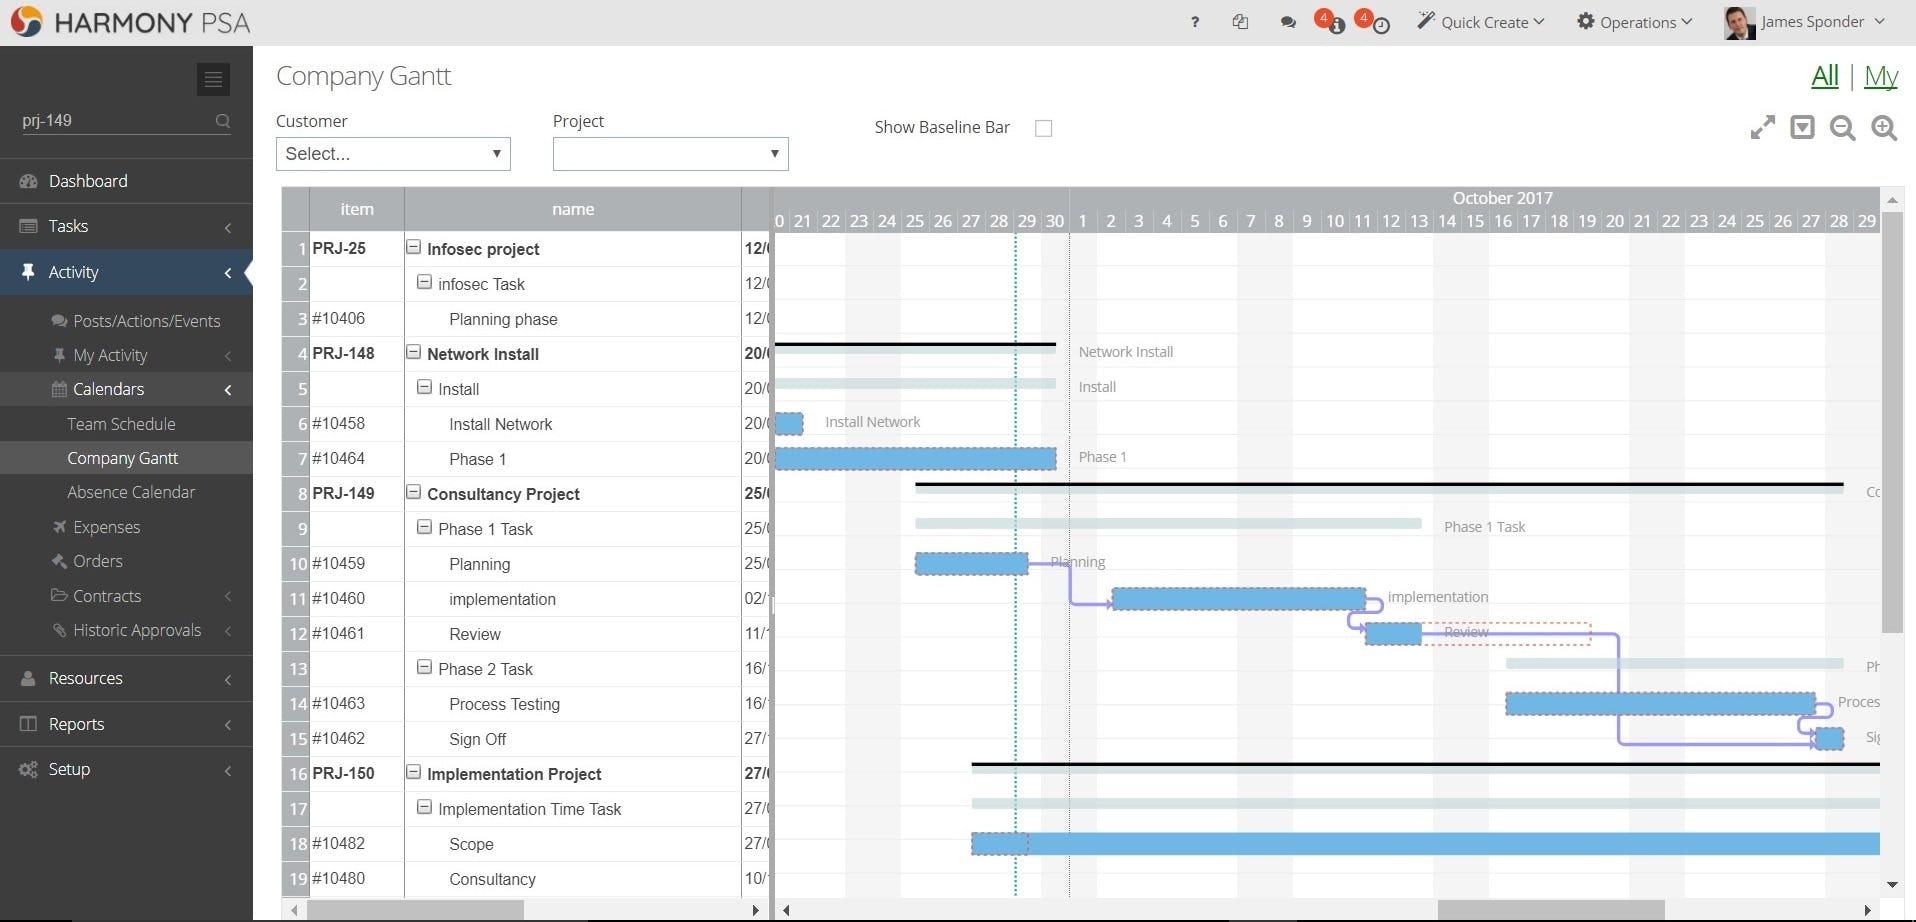 HarmonyPSA Software - Company Gantt chart